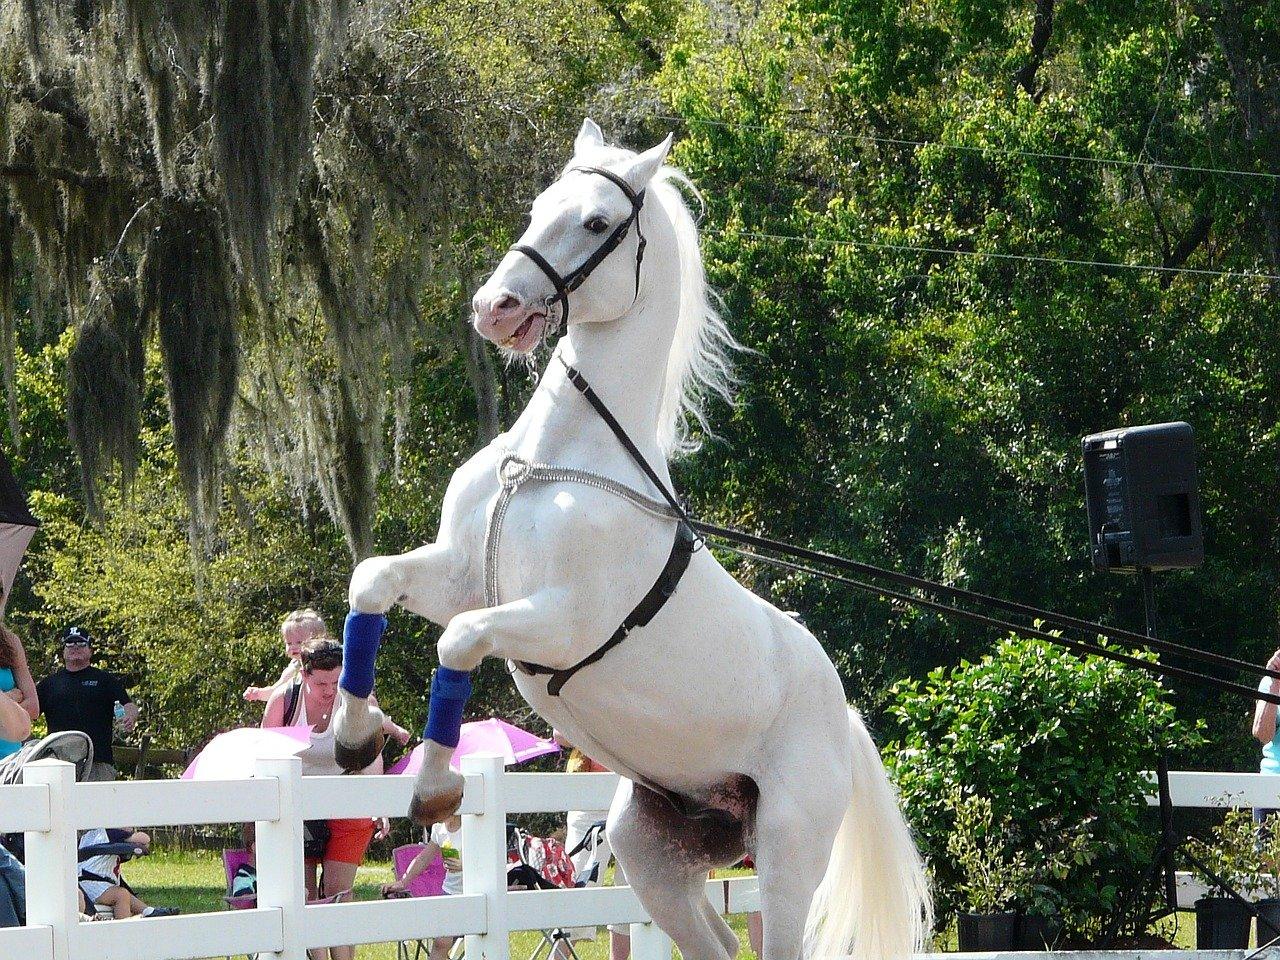 cai Lipitani, rasa calului dansator